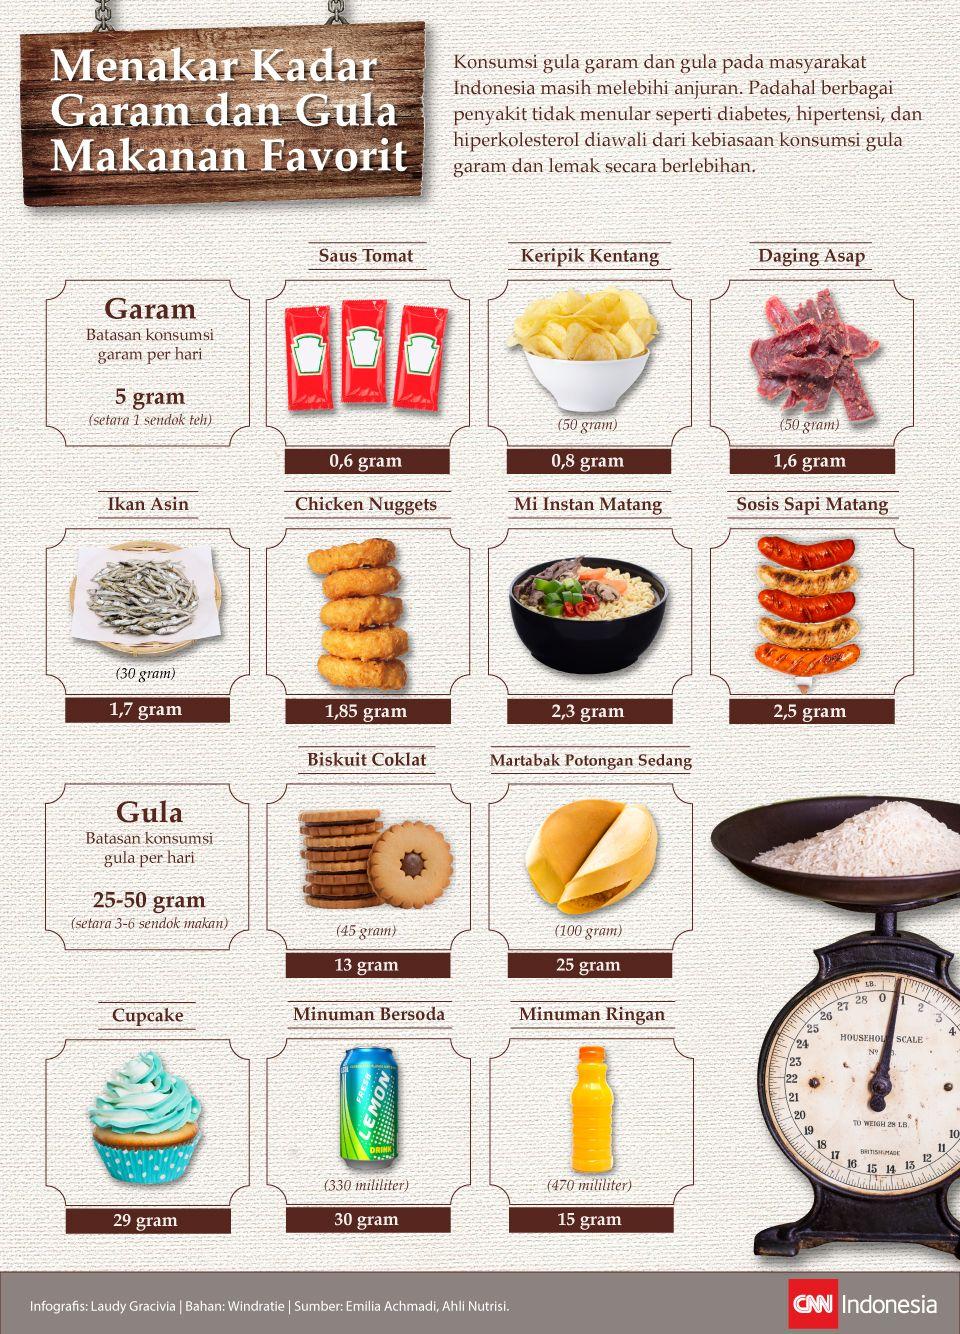 Infografis menakar kadar gula dan garam makanan favorit